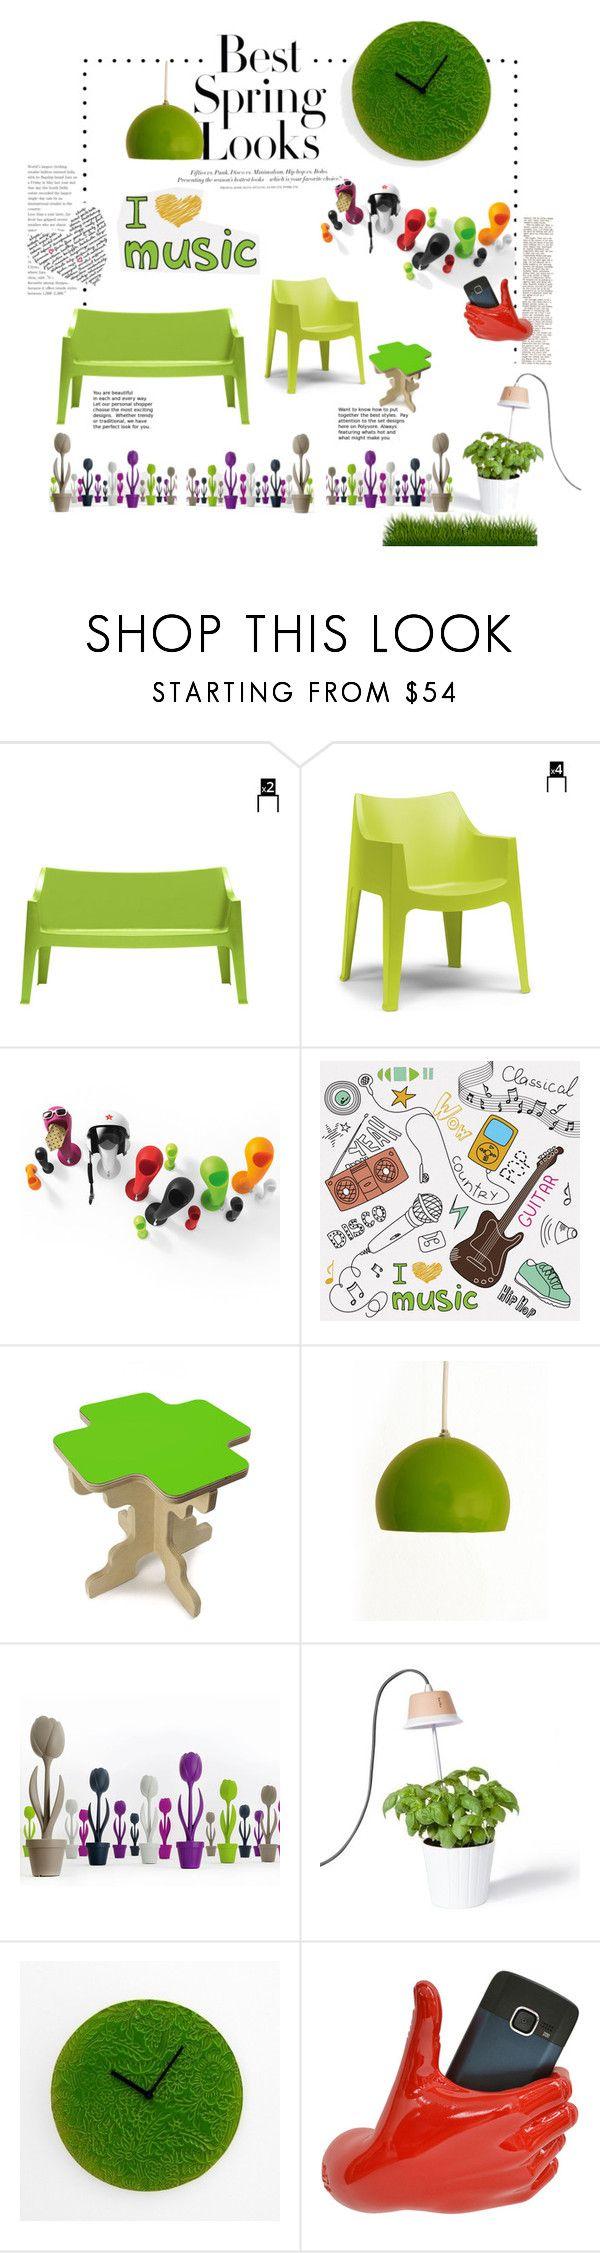 """Home Spring Look"" by viadurini ❤ liked on Polyvore featuring interior, interiors, interior design, home, home decor, interior decorating, MyYour, H&M and BRIO"